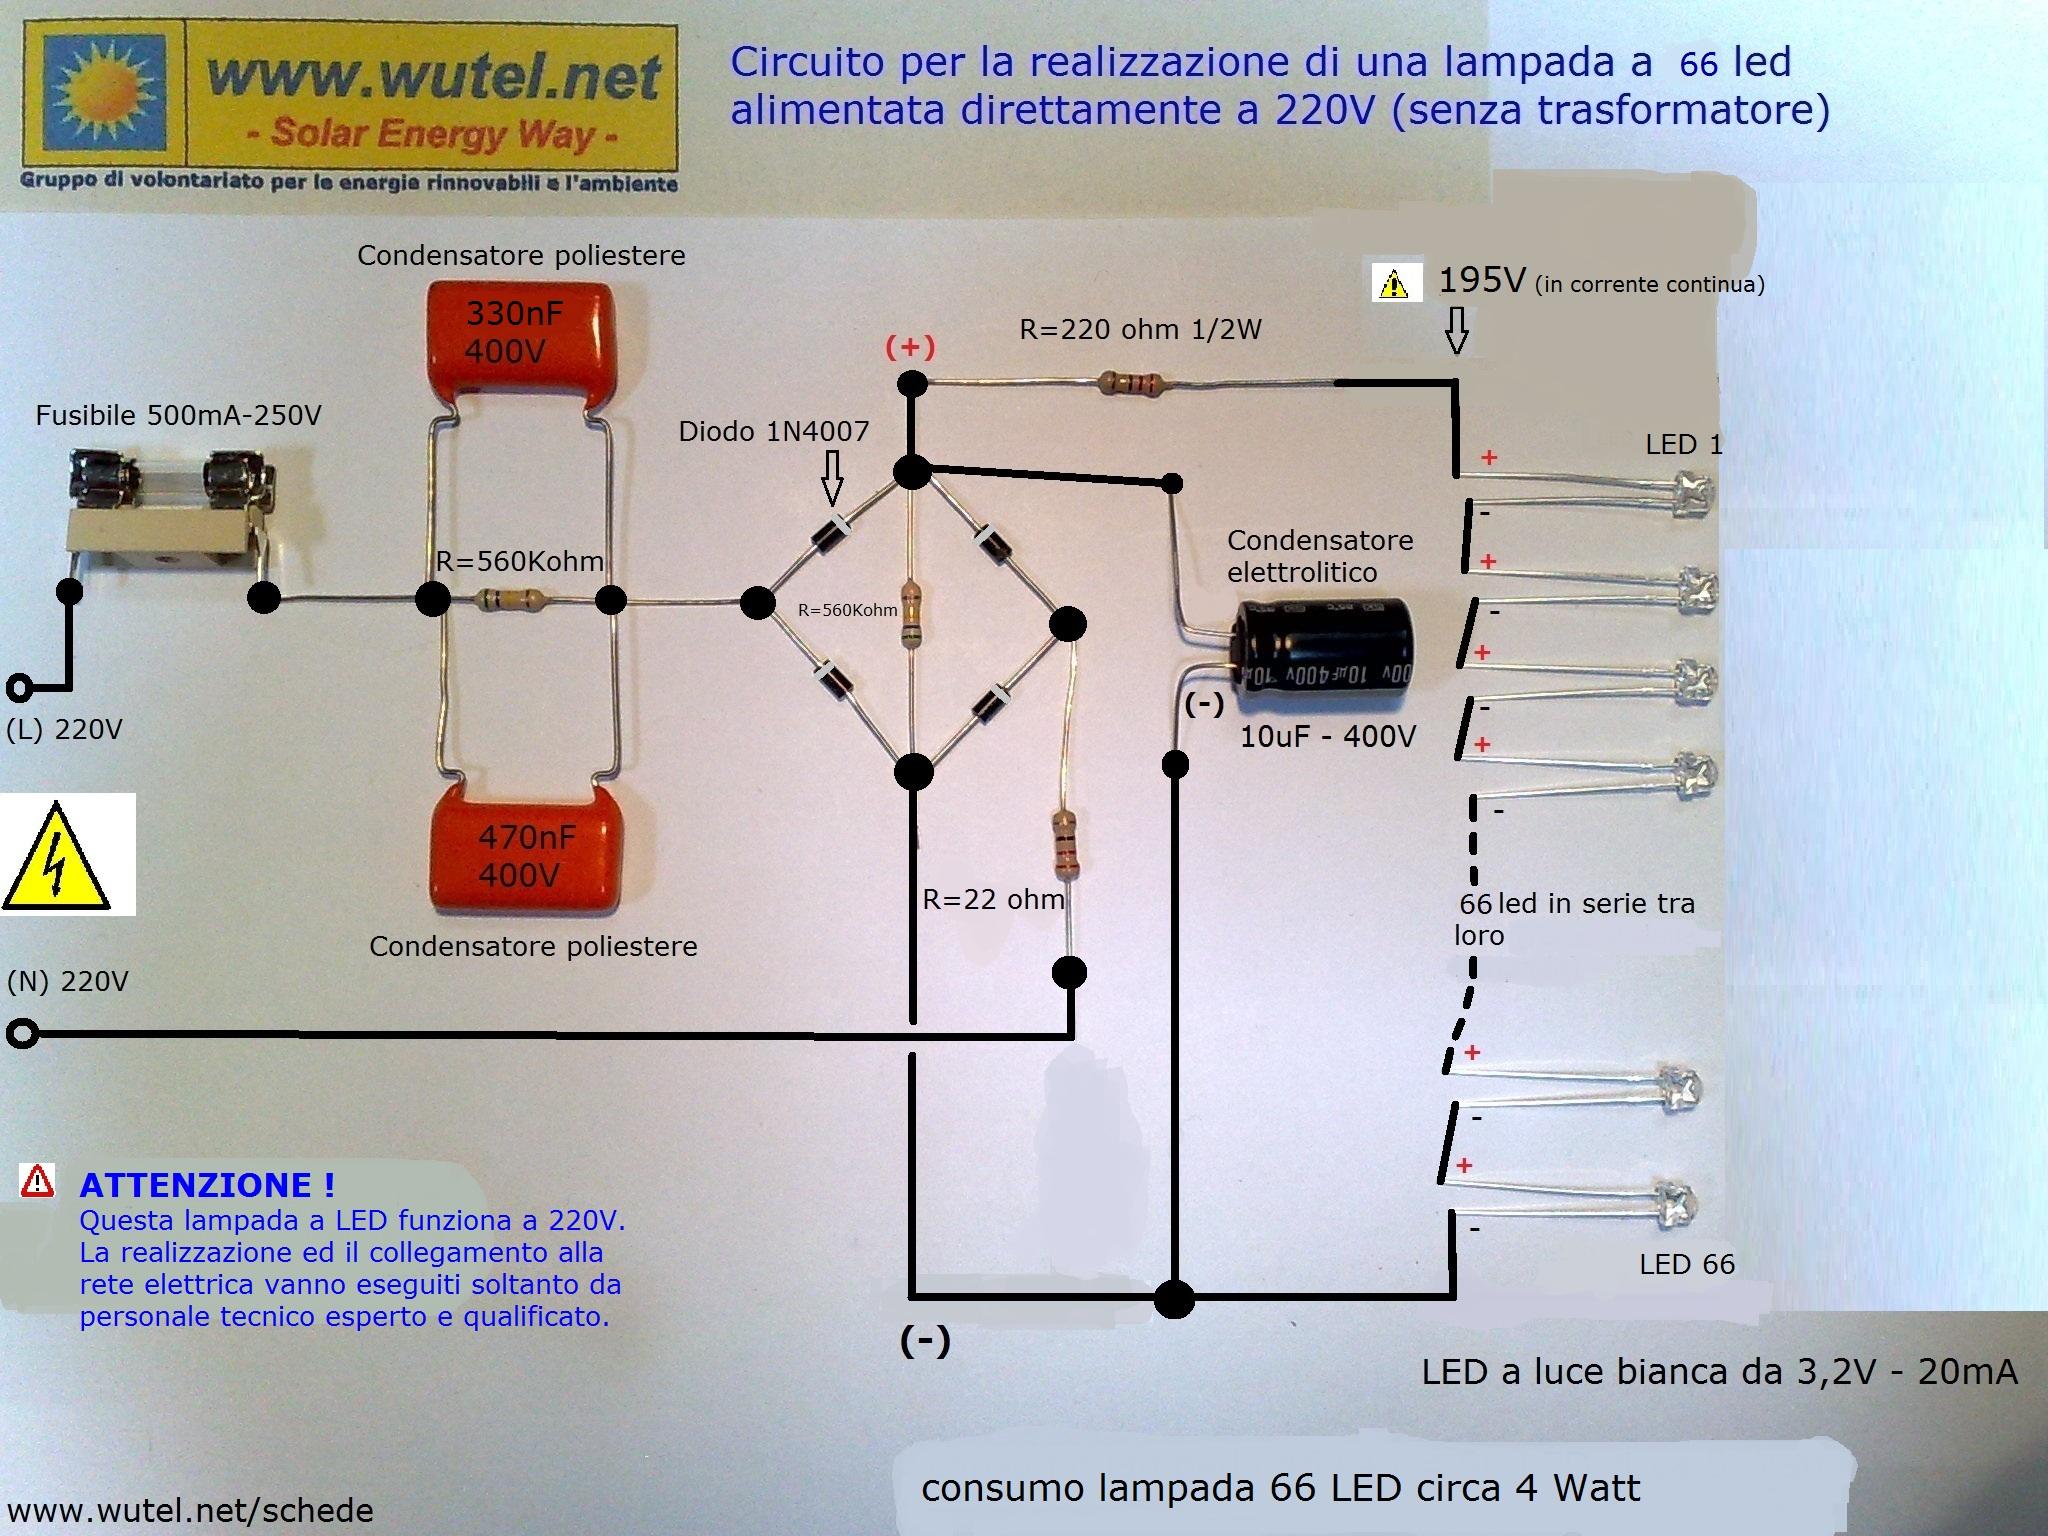 Schema Elettrico Lampada : Www.wutel.net schede tecniche